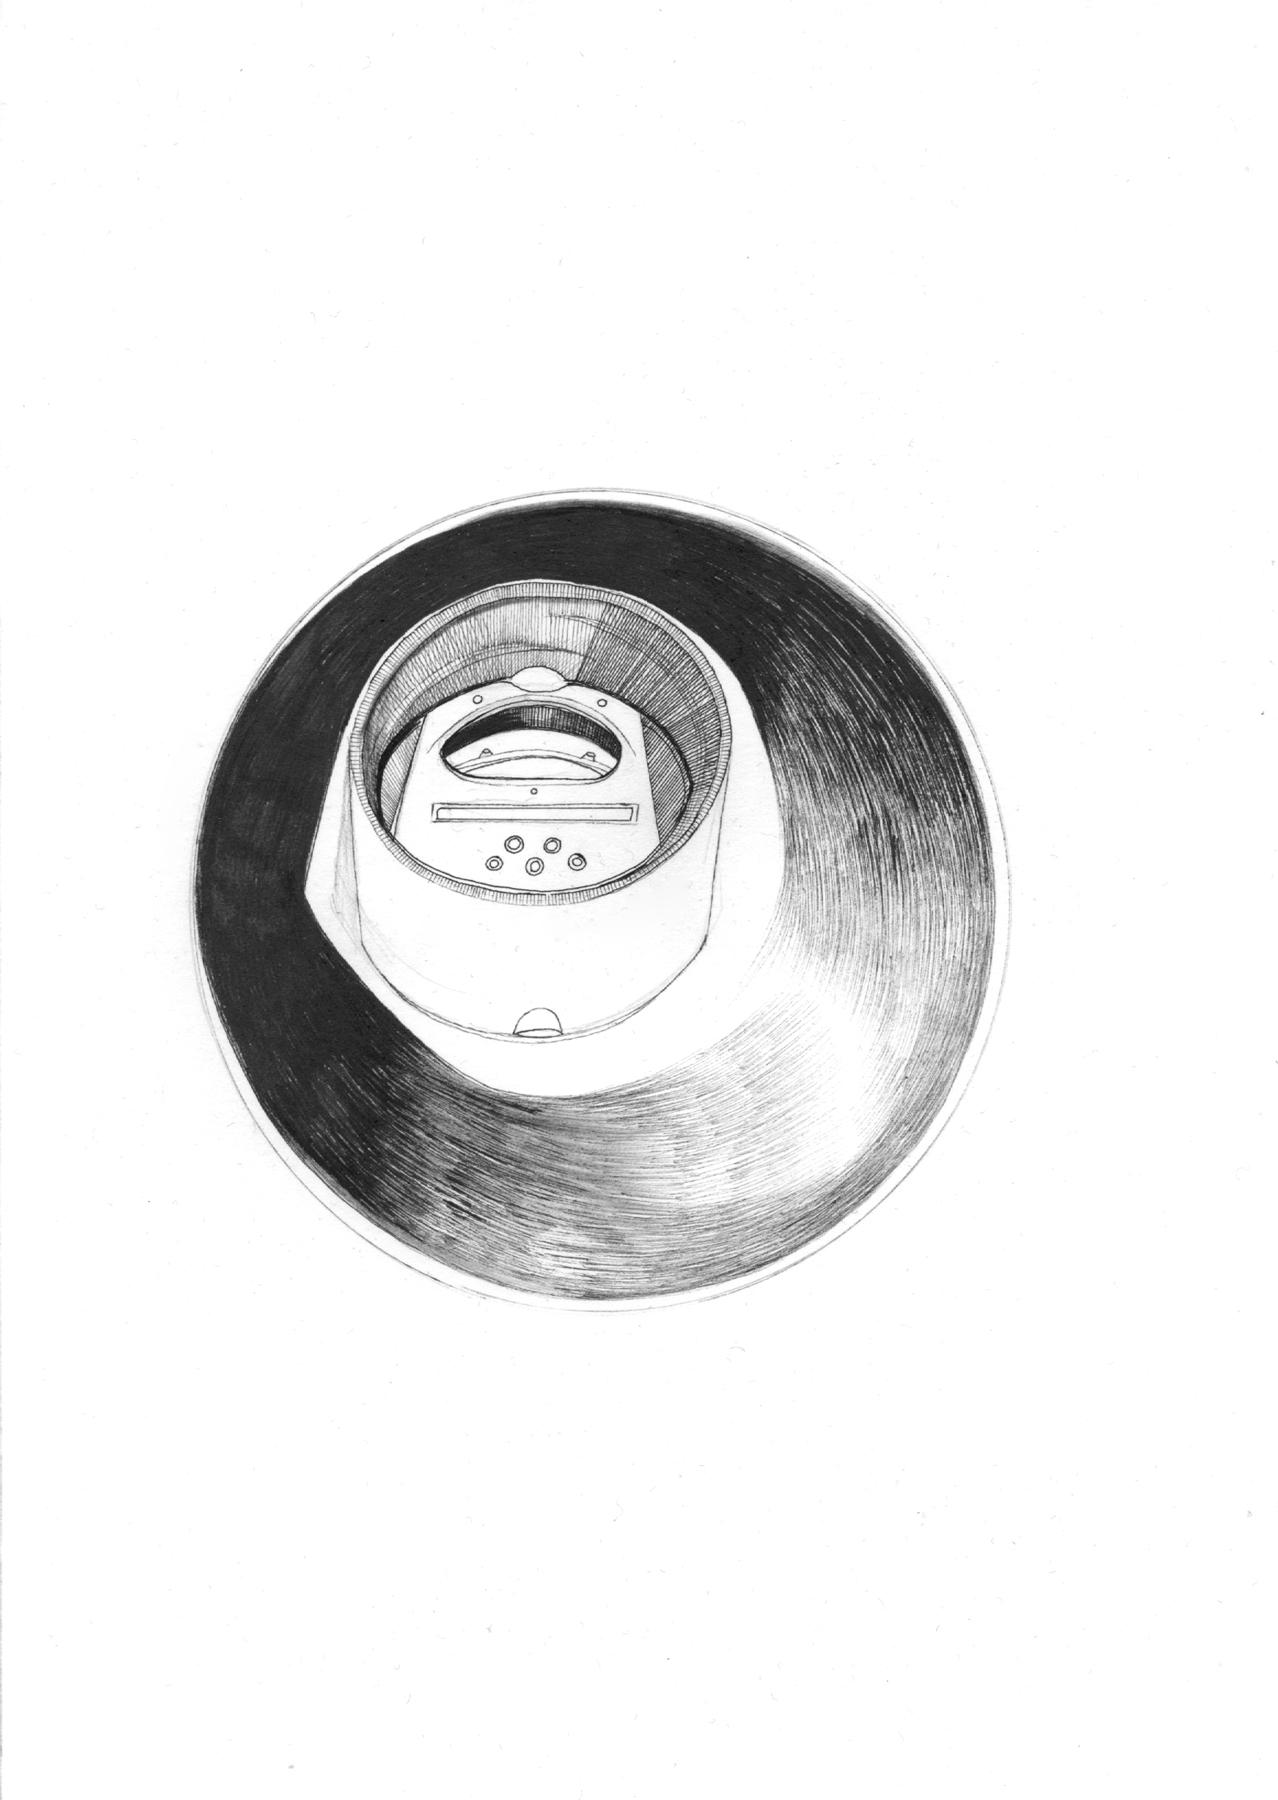 Nina Annabelle Märkl | Fragments III | ink on paper | 21 x 15 cm